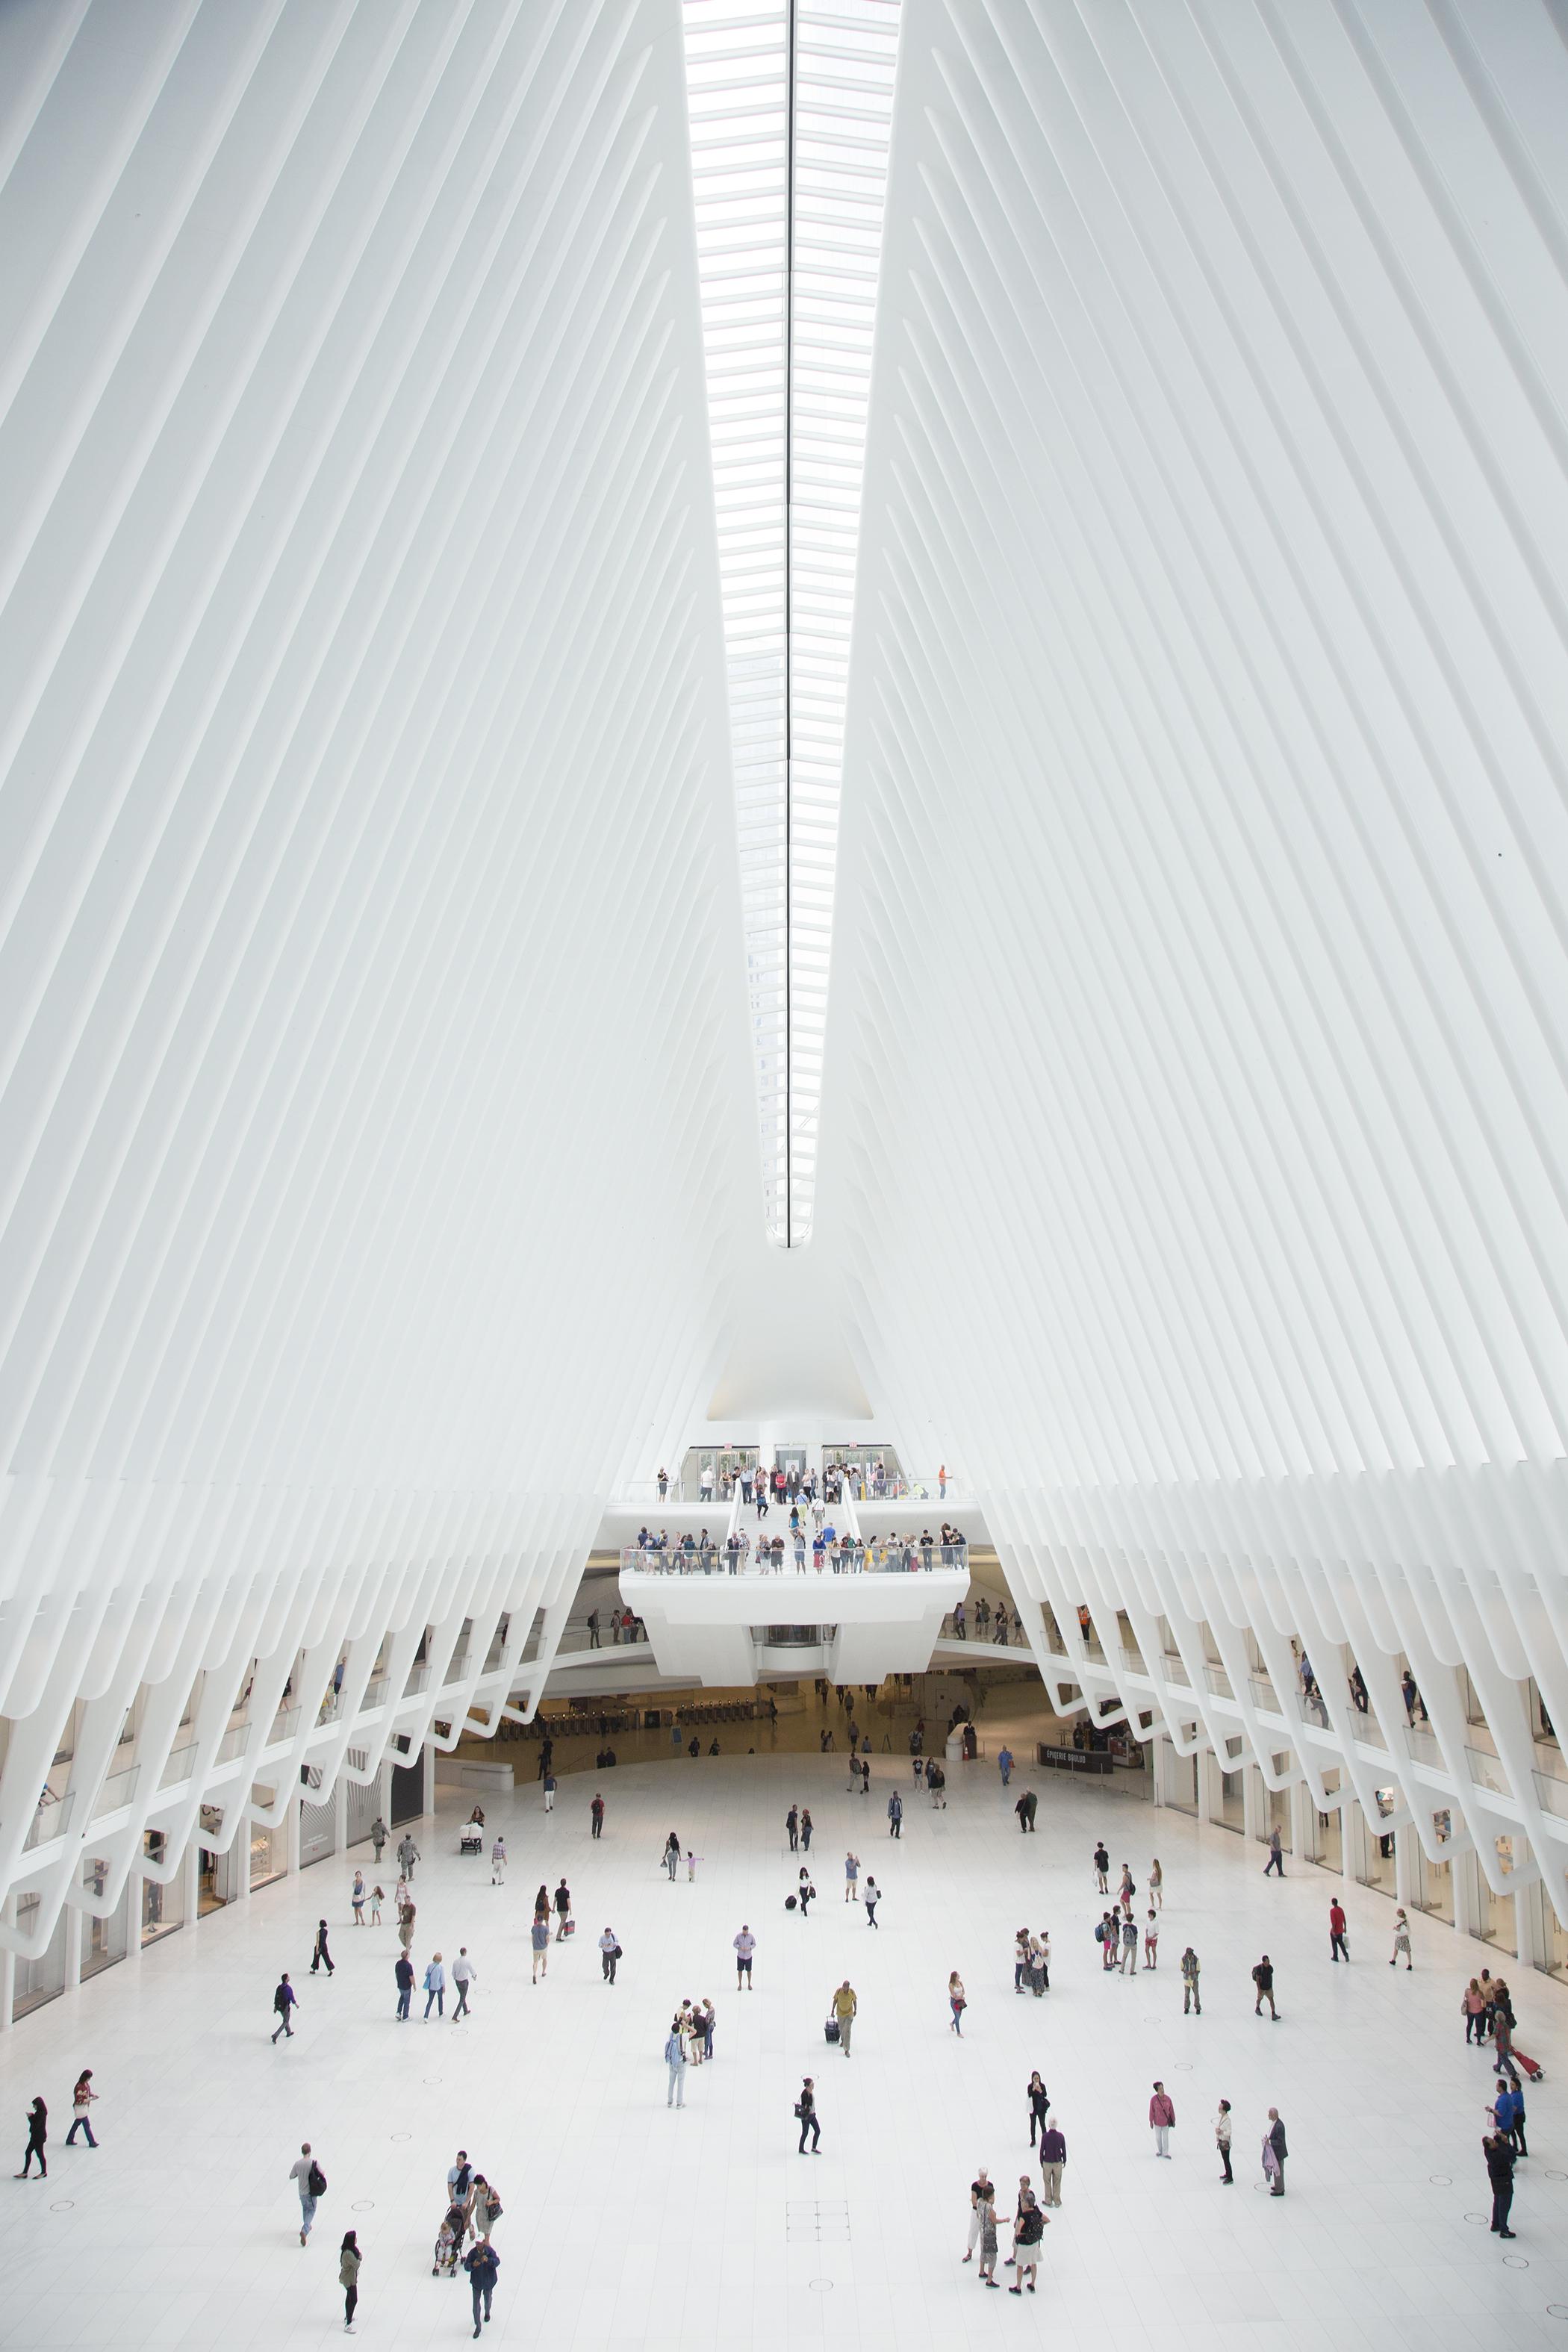 Santiago Calatrava's Oculus design inside of the World Trade Center transportation hub.